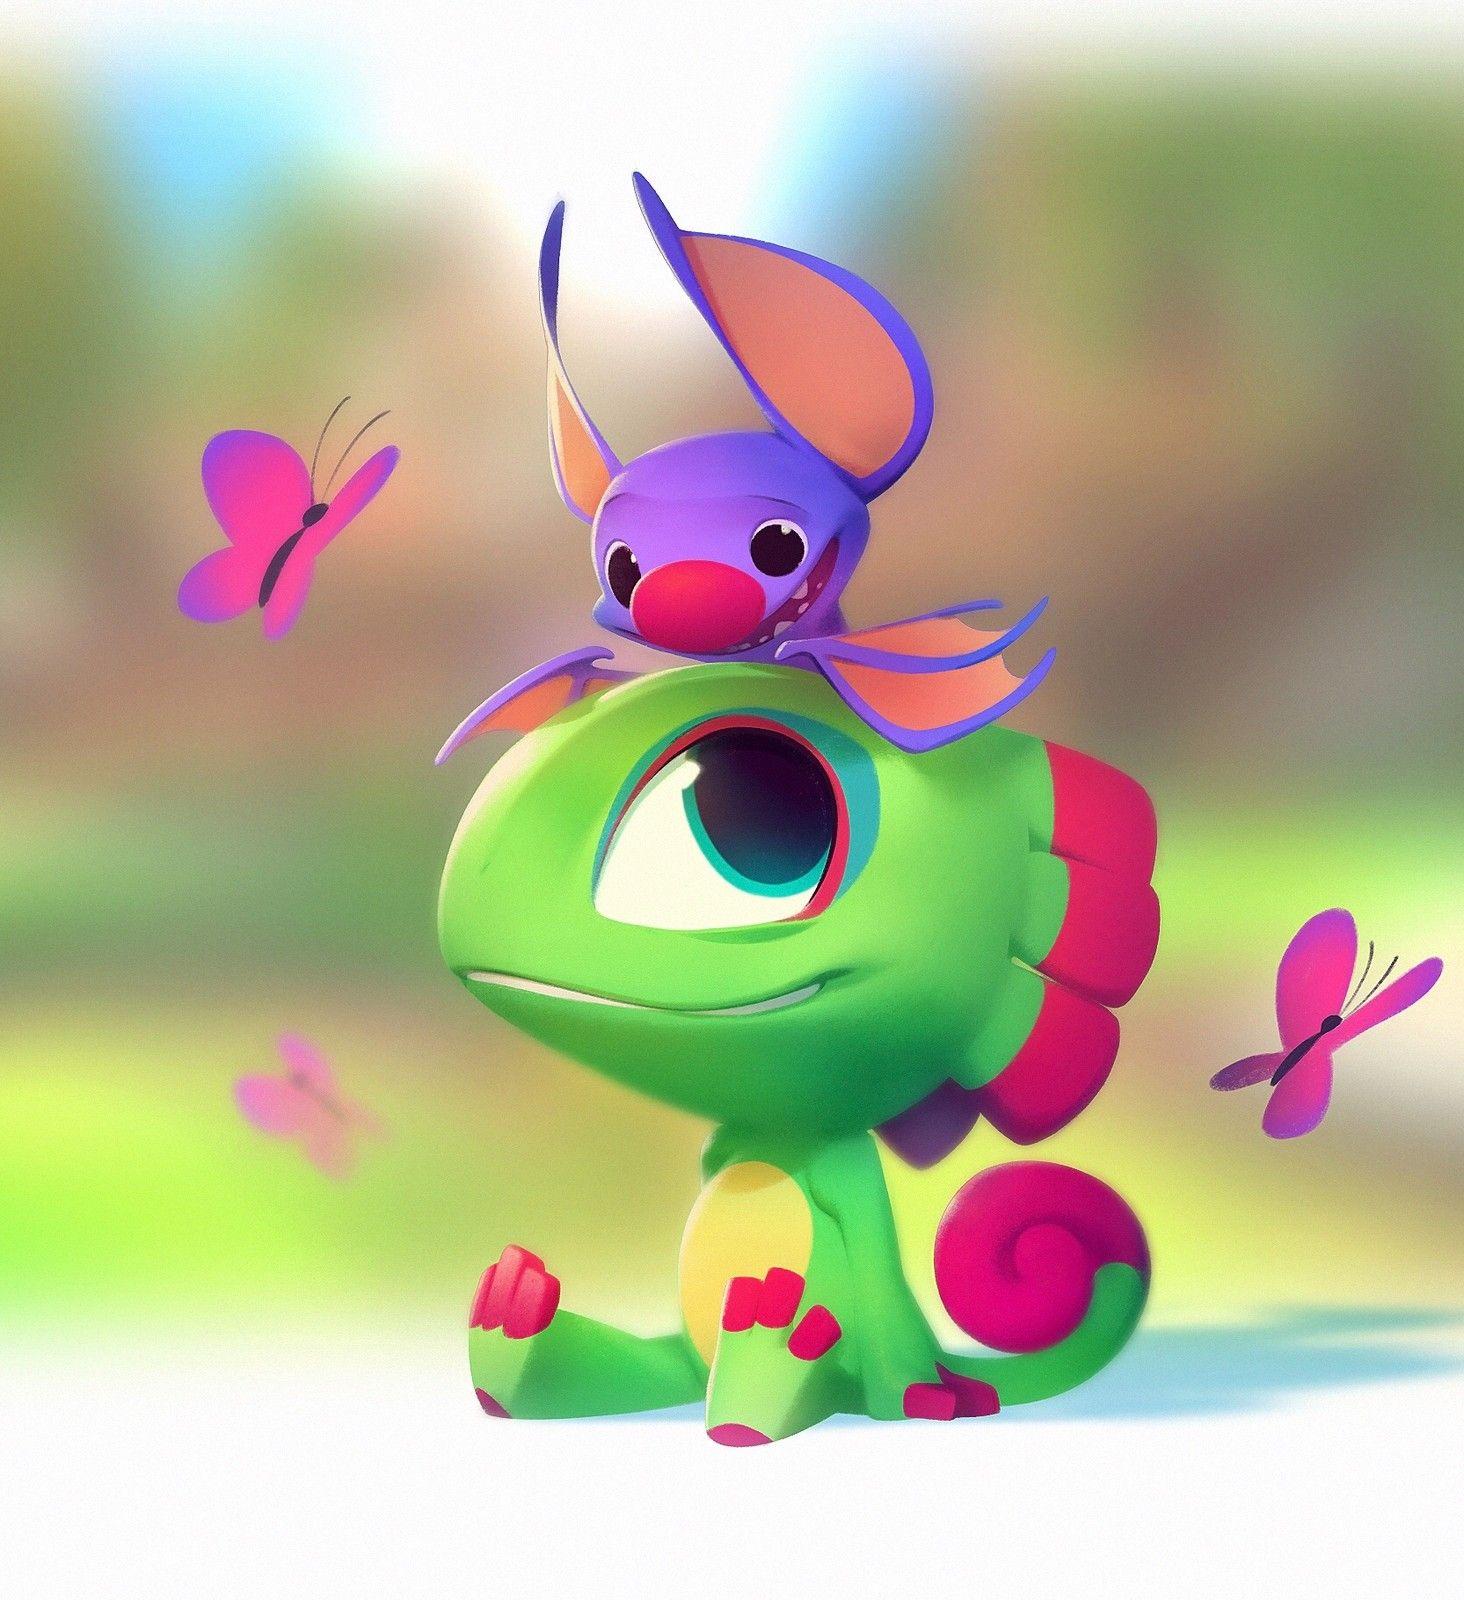 Yooka Laylee Nicholas Kole On Artstation At Https Www Artstation Com Artwork 66z1v Cute Art Emotional Art Game Character Design